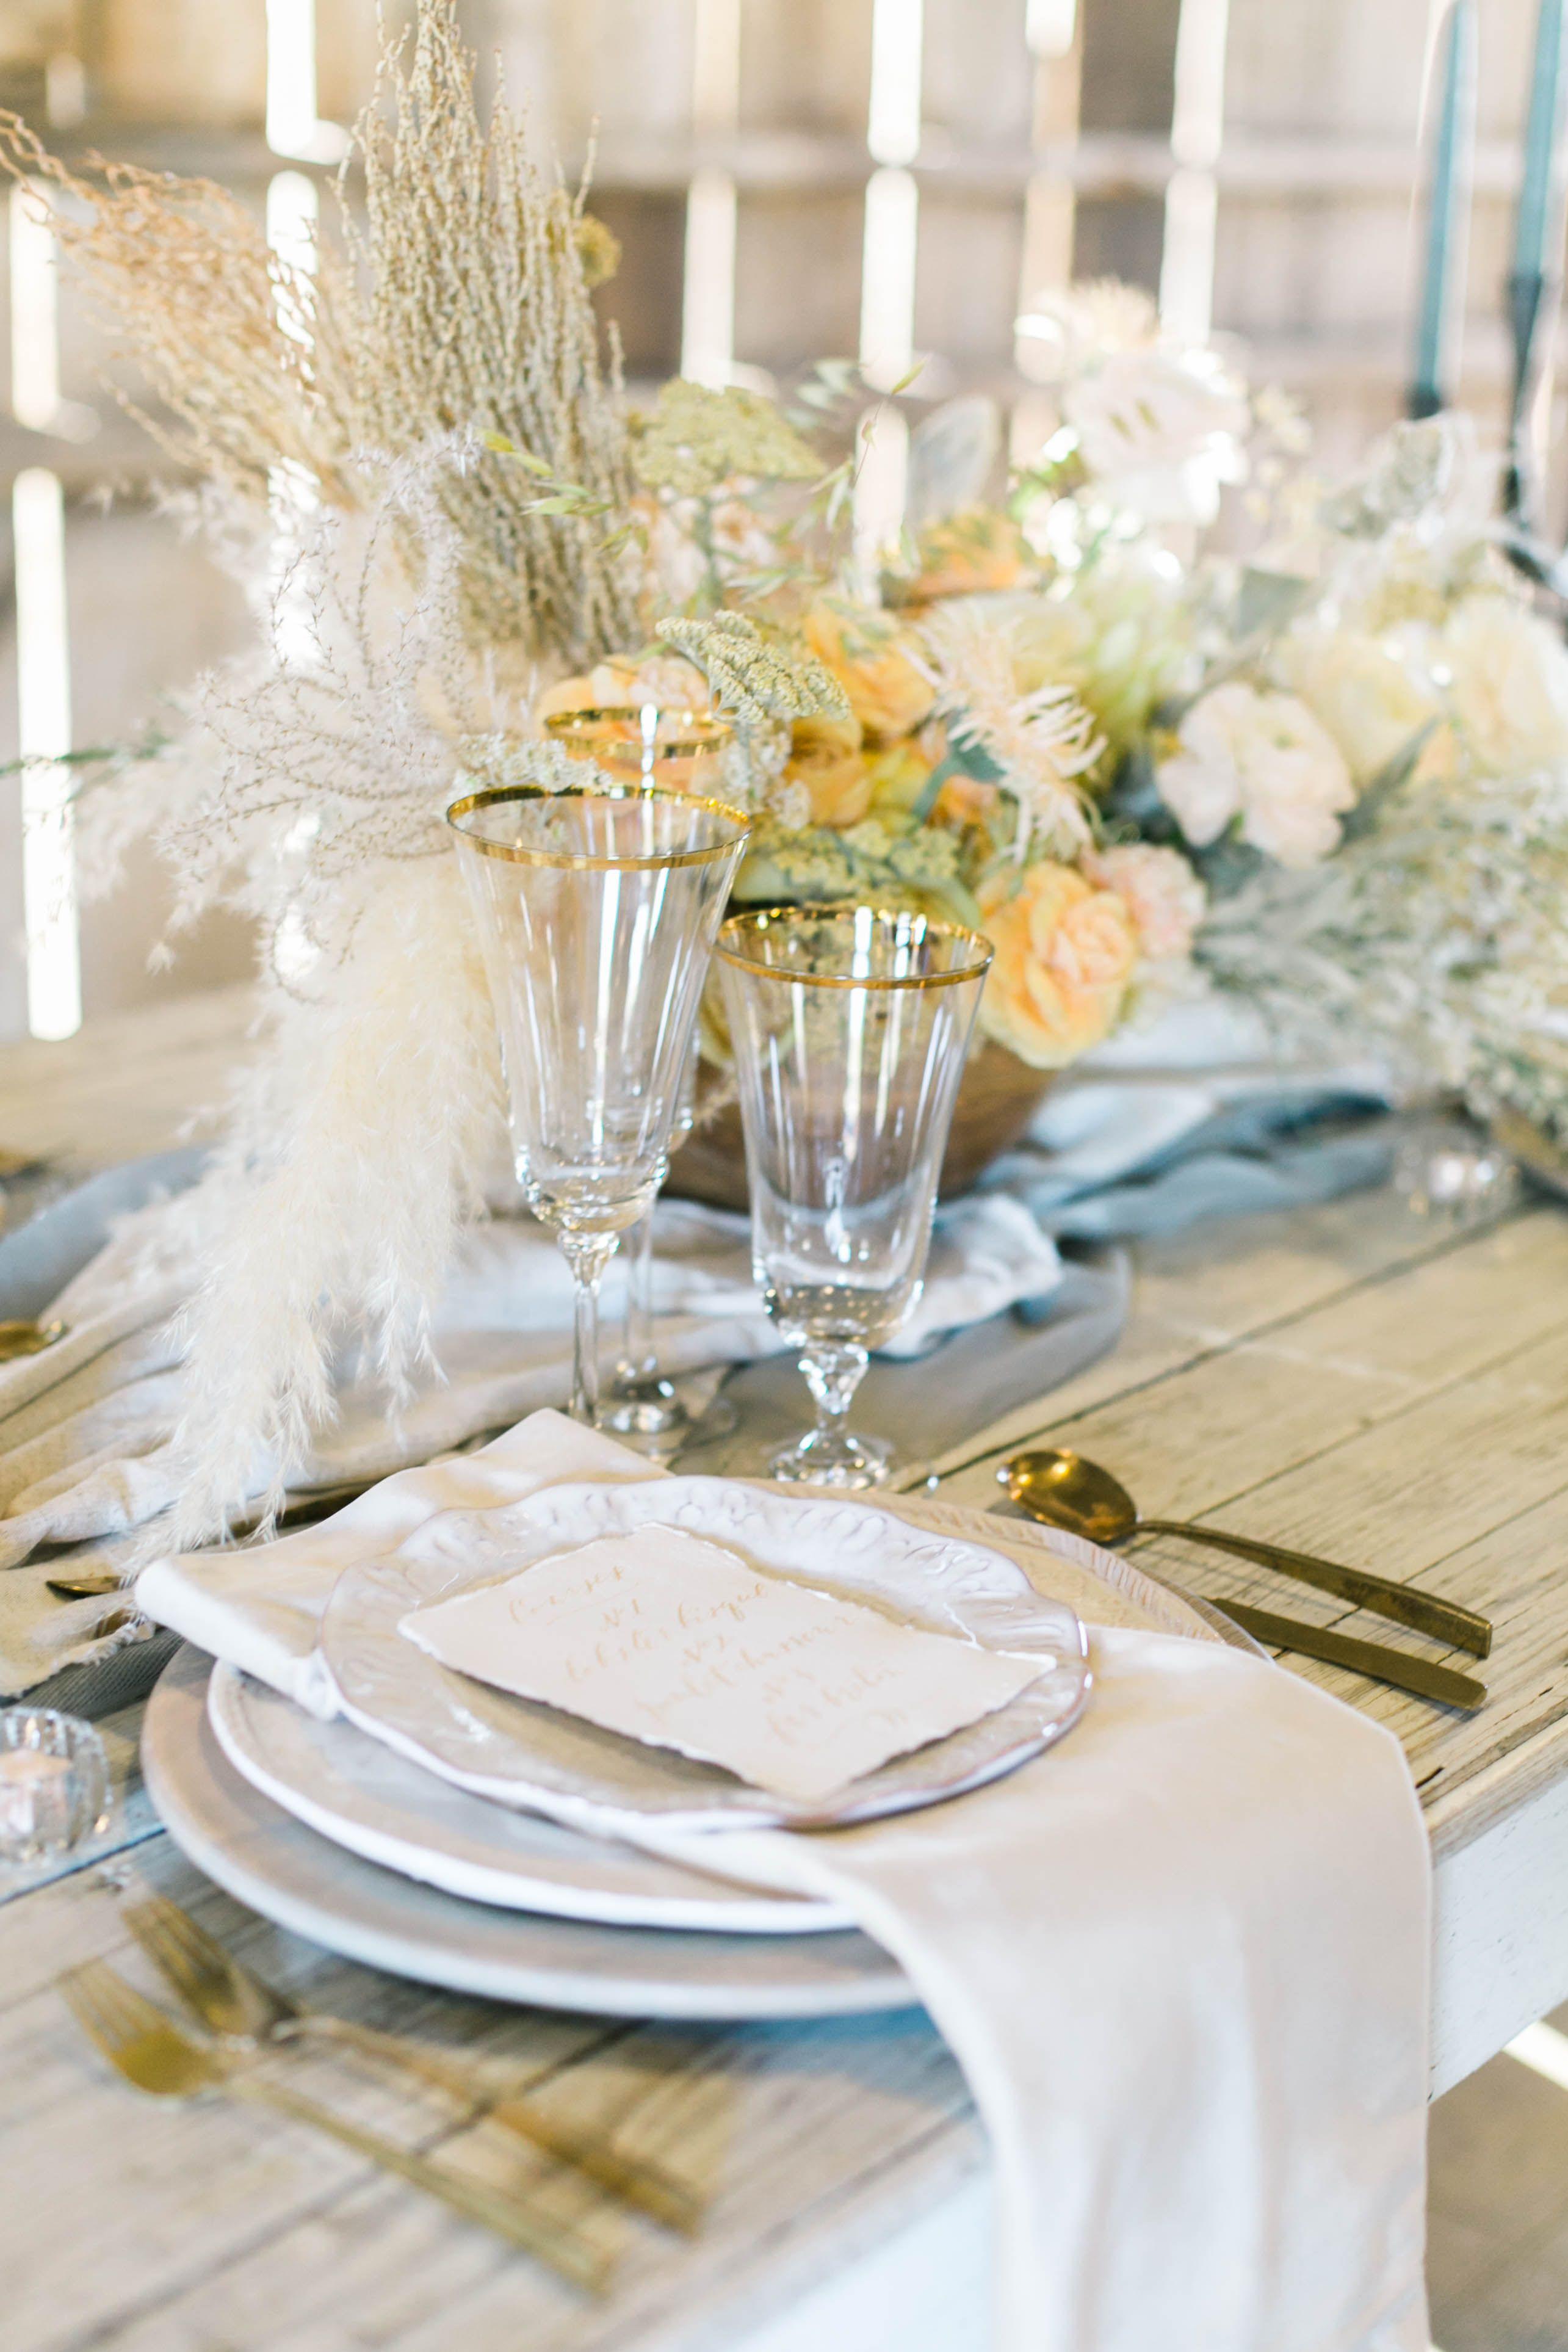 pin by dakota lynn photography on boho chic styled shoot table decorations on boho chic kitchen table decor id=94560